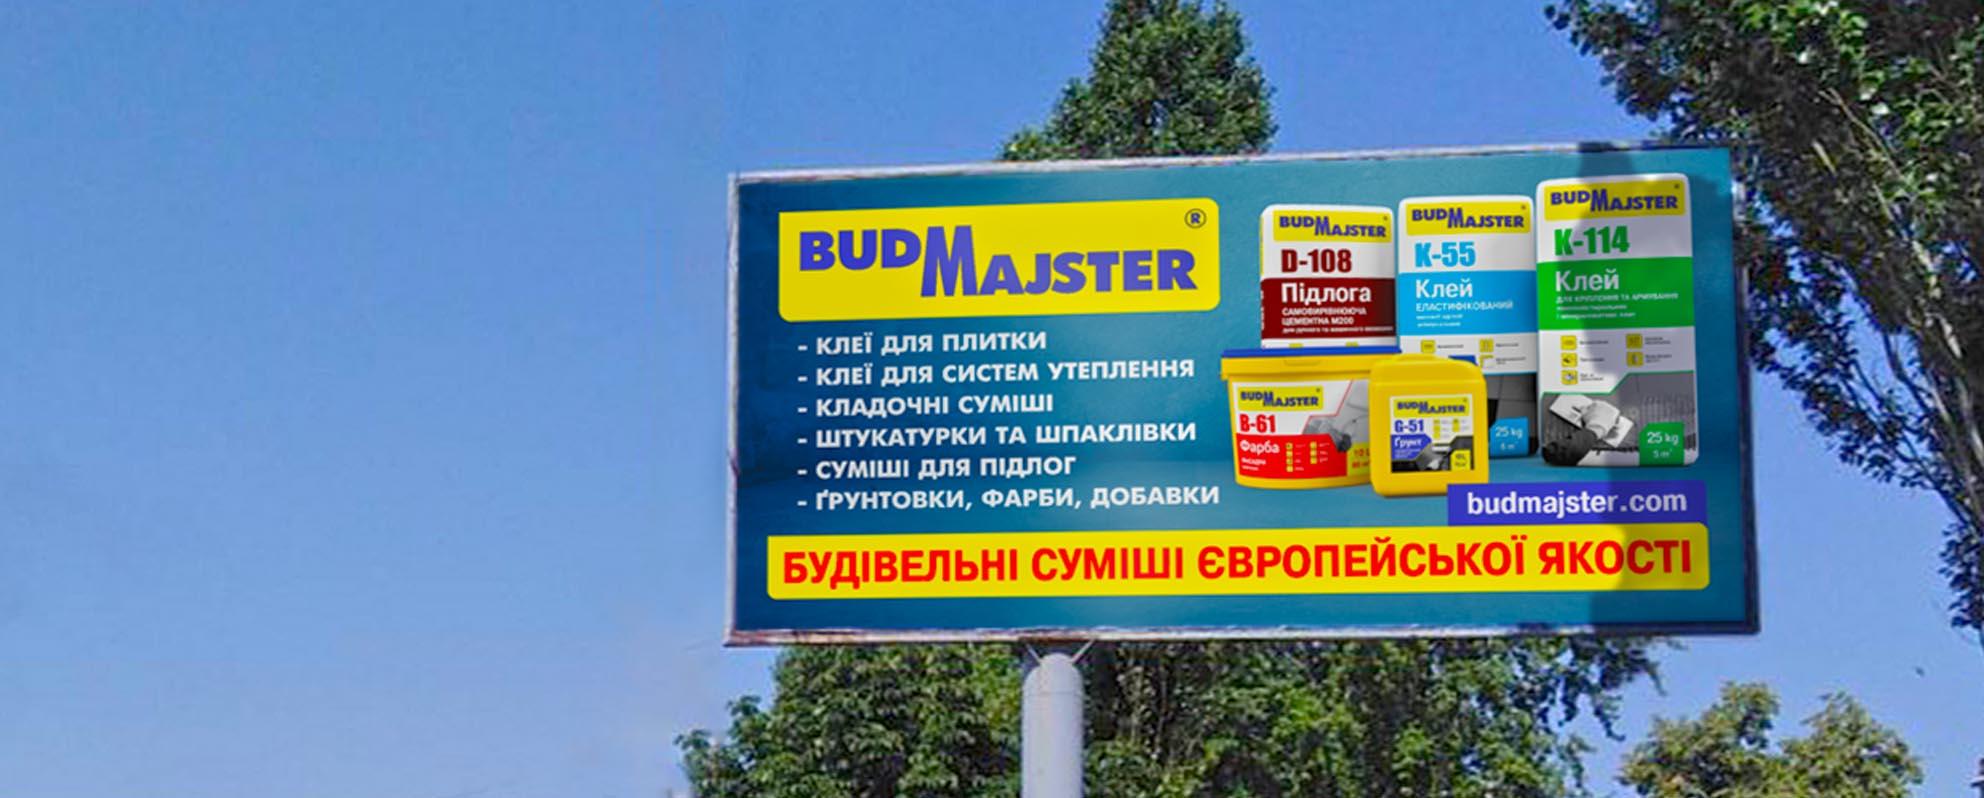 Реклама компании Будмайстер на билбордах